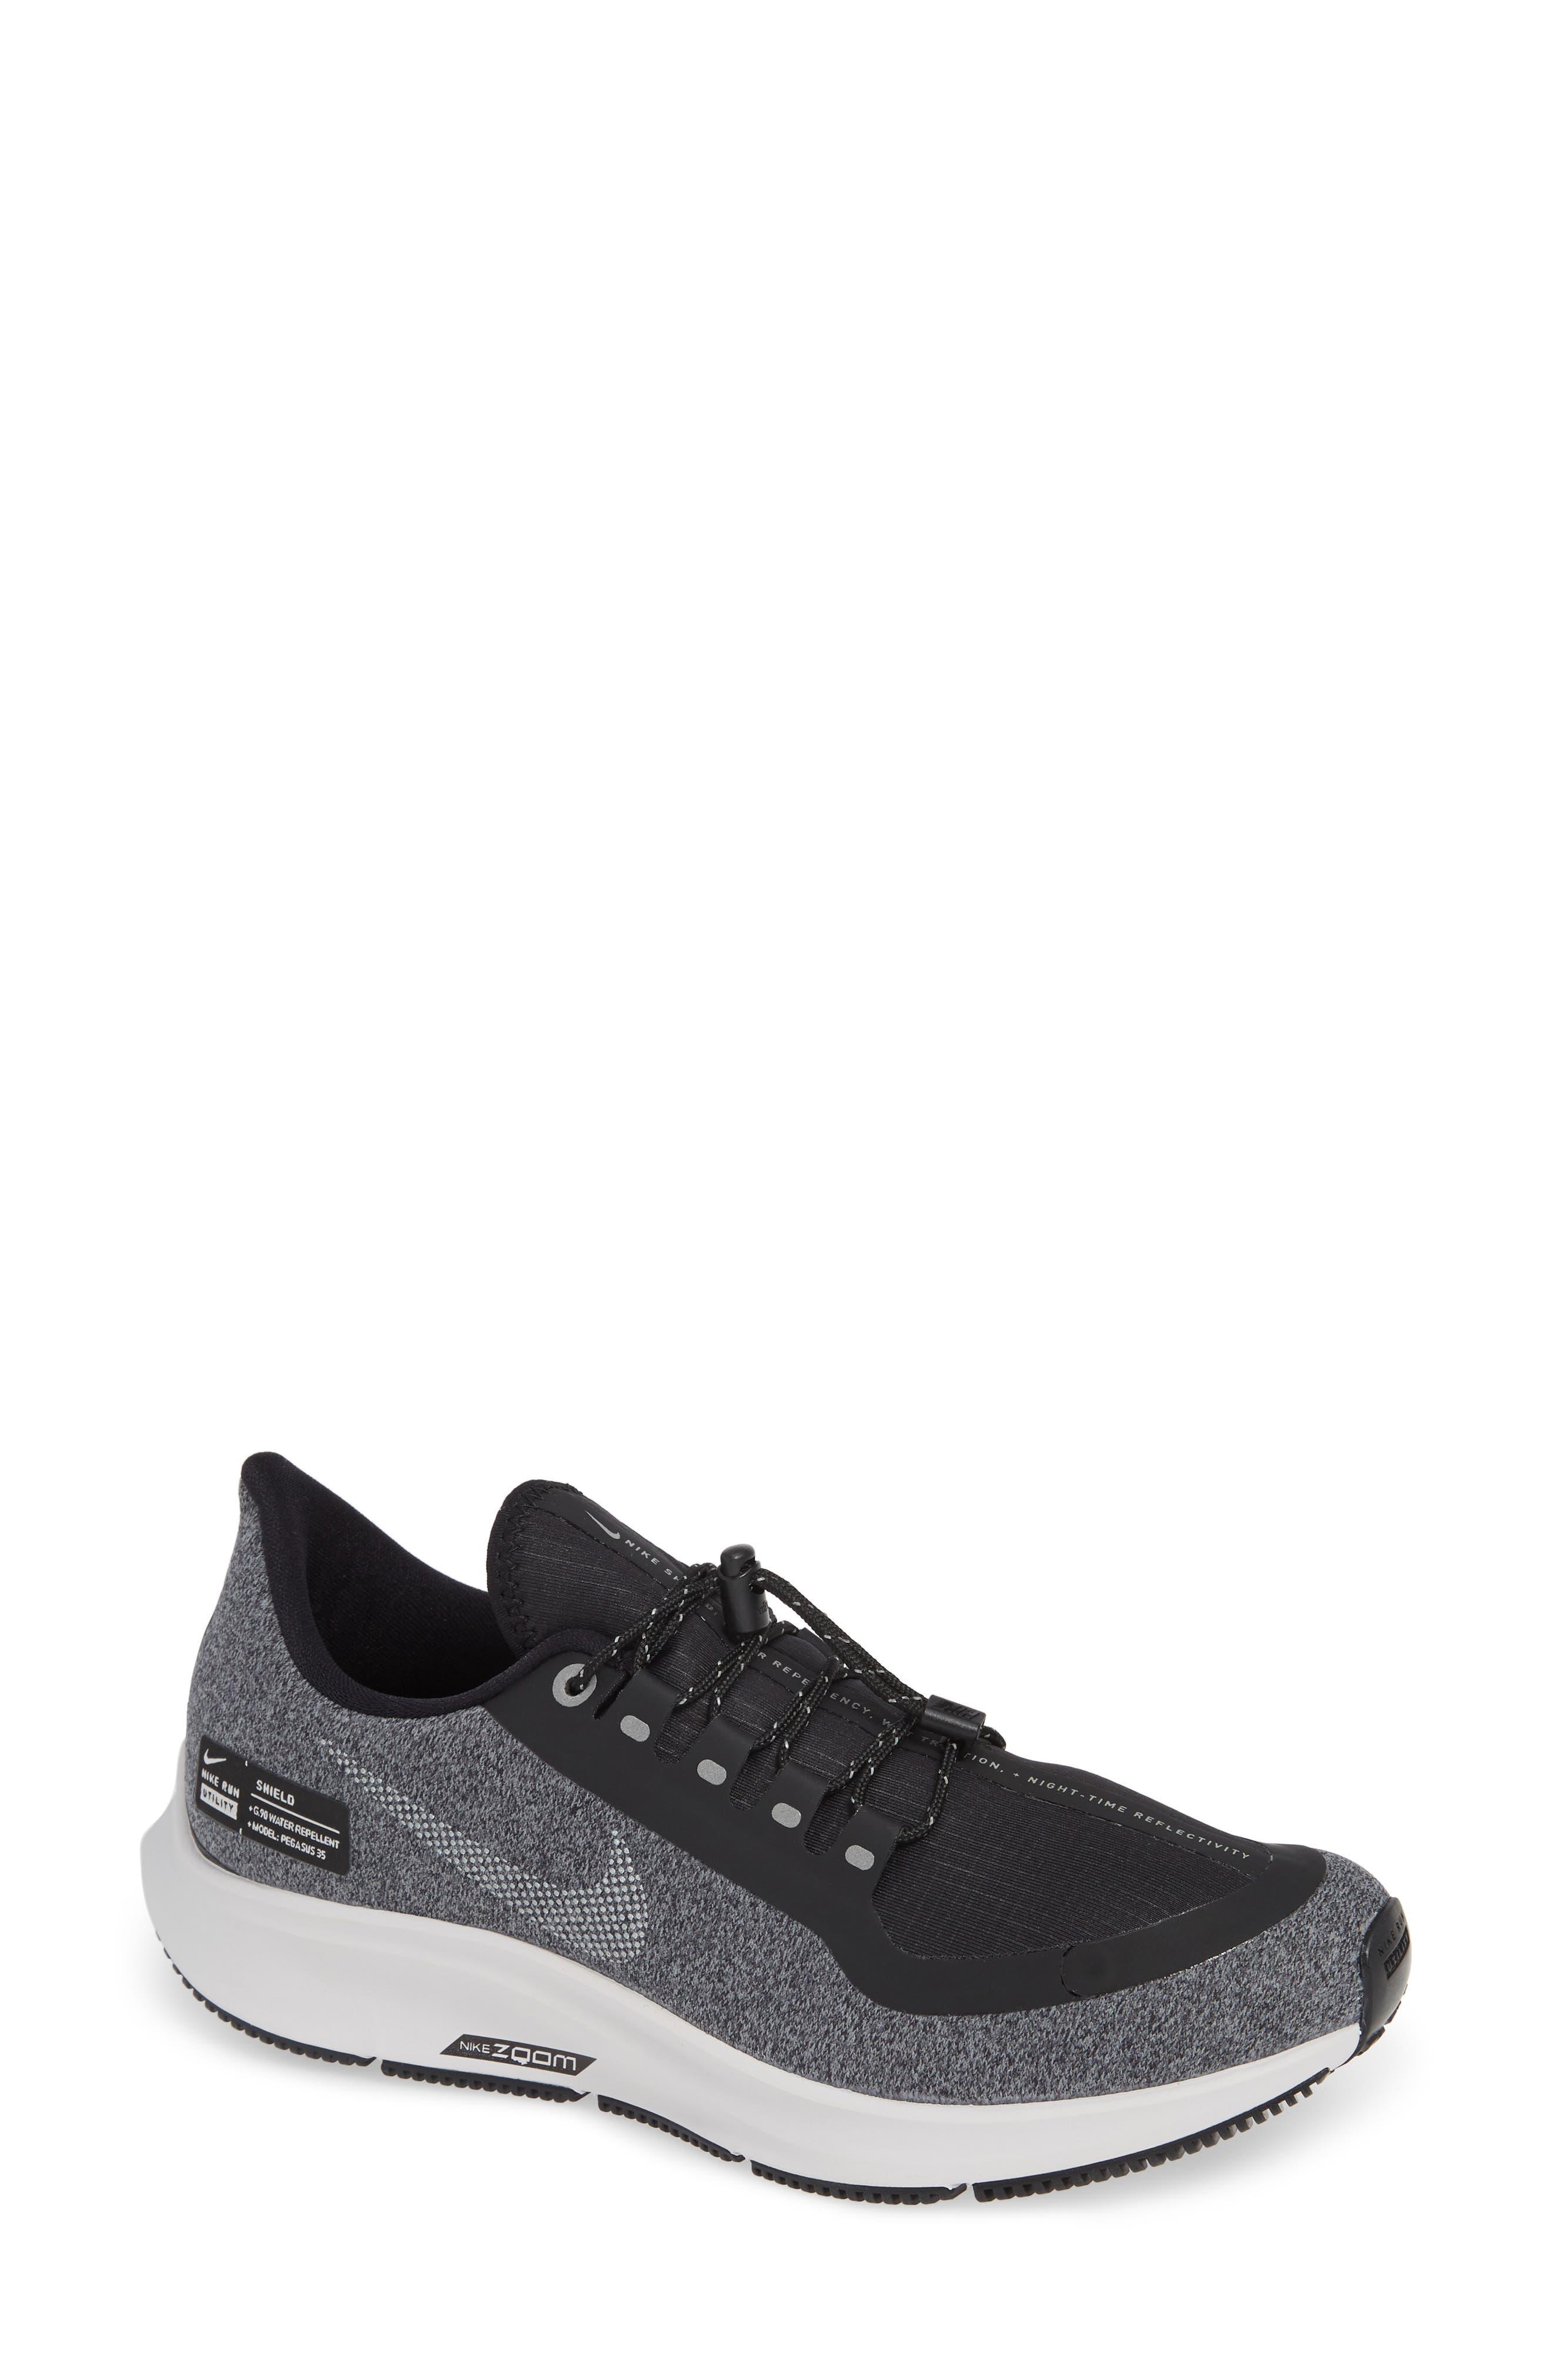 Air Zoom Pegasus 35 Shield GS Water Repellent Running Shoe,                             Main thumbnail 1, color,                             BLACK/ WHITE-COOL GREY-GREY